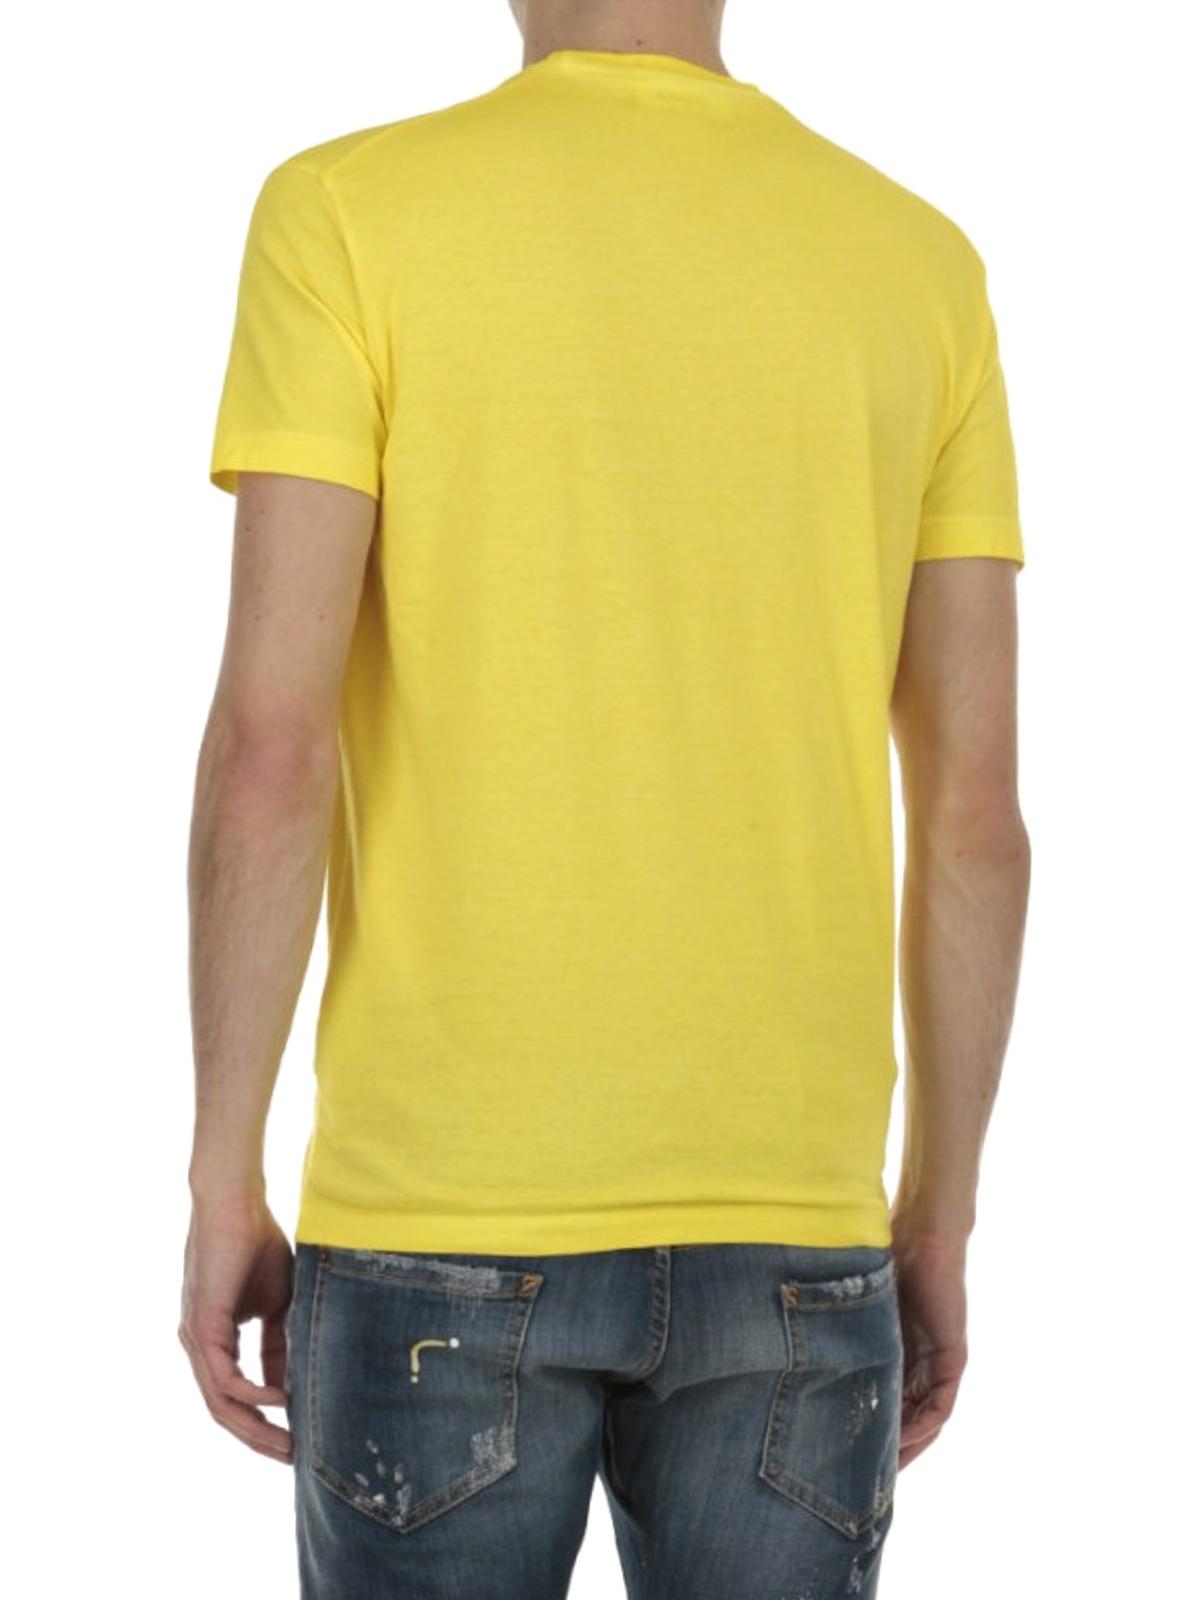 Dsquared2 - T-shirt in cotone con logo - t-shirt - GD0512 S21600 172 e7d2fc9f8d41